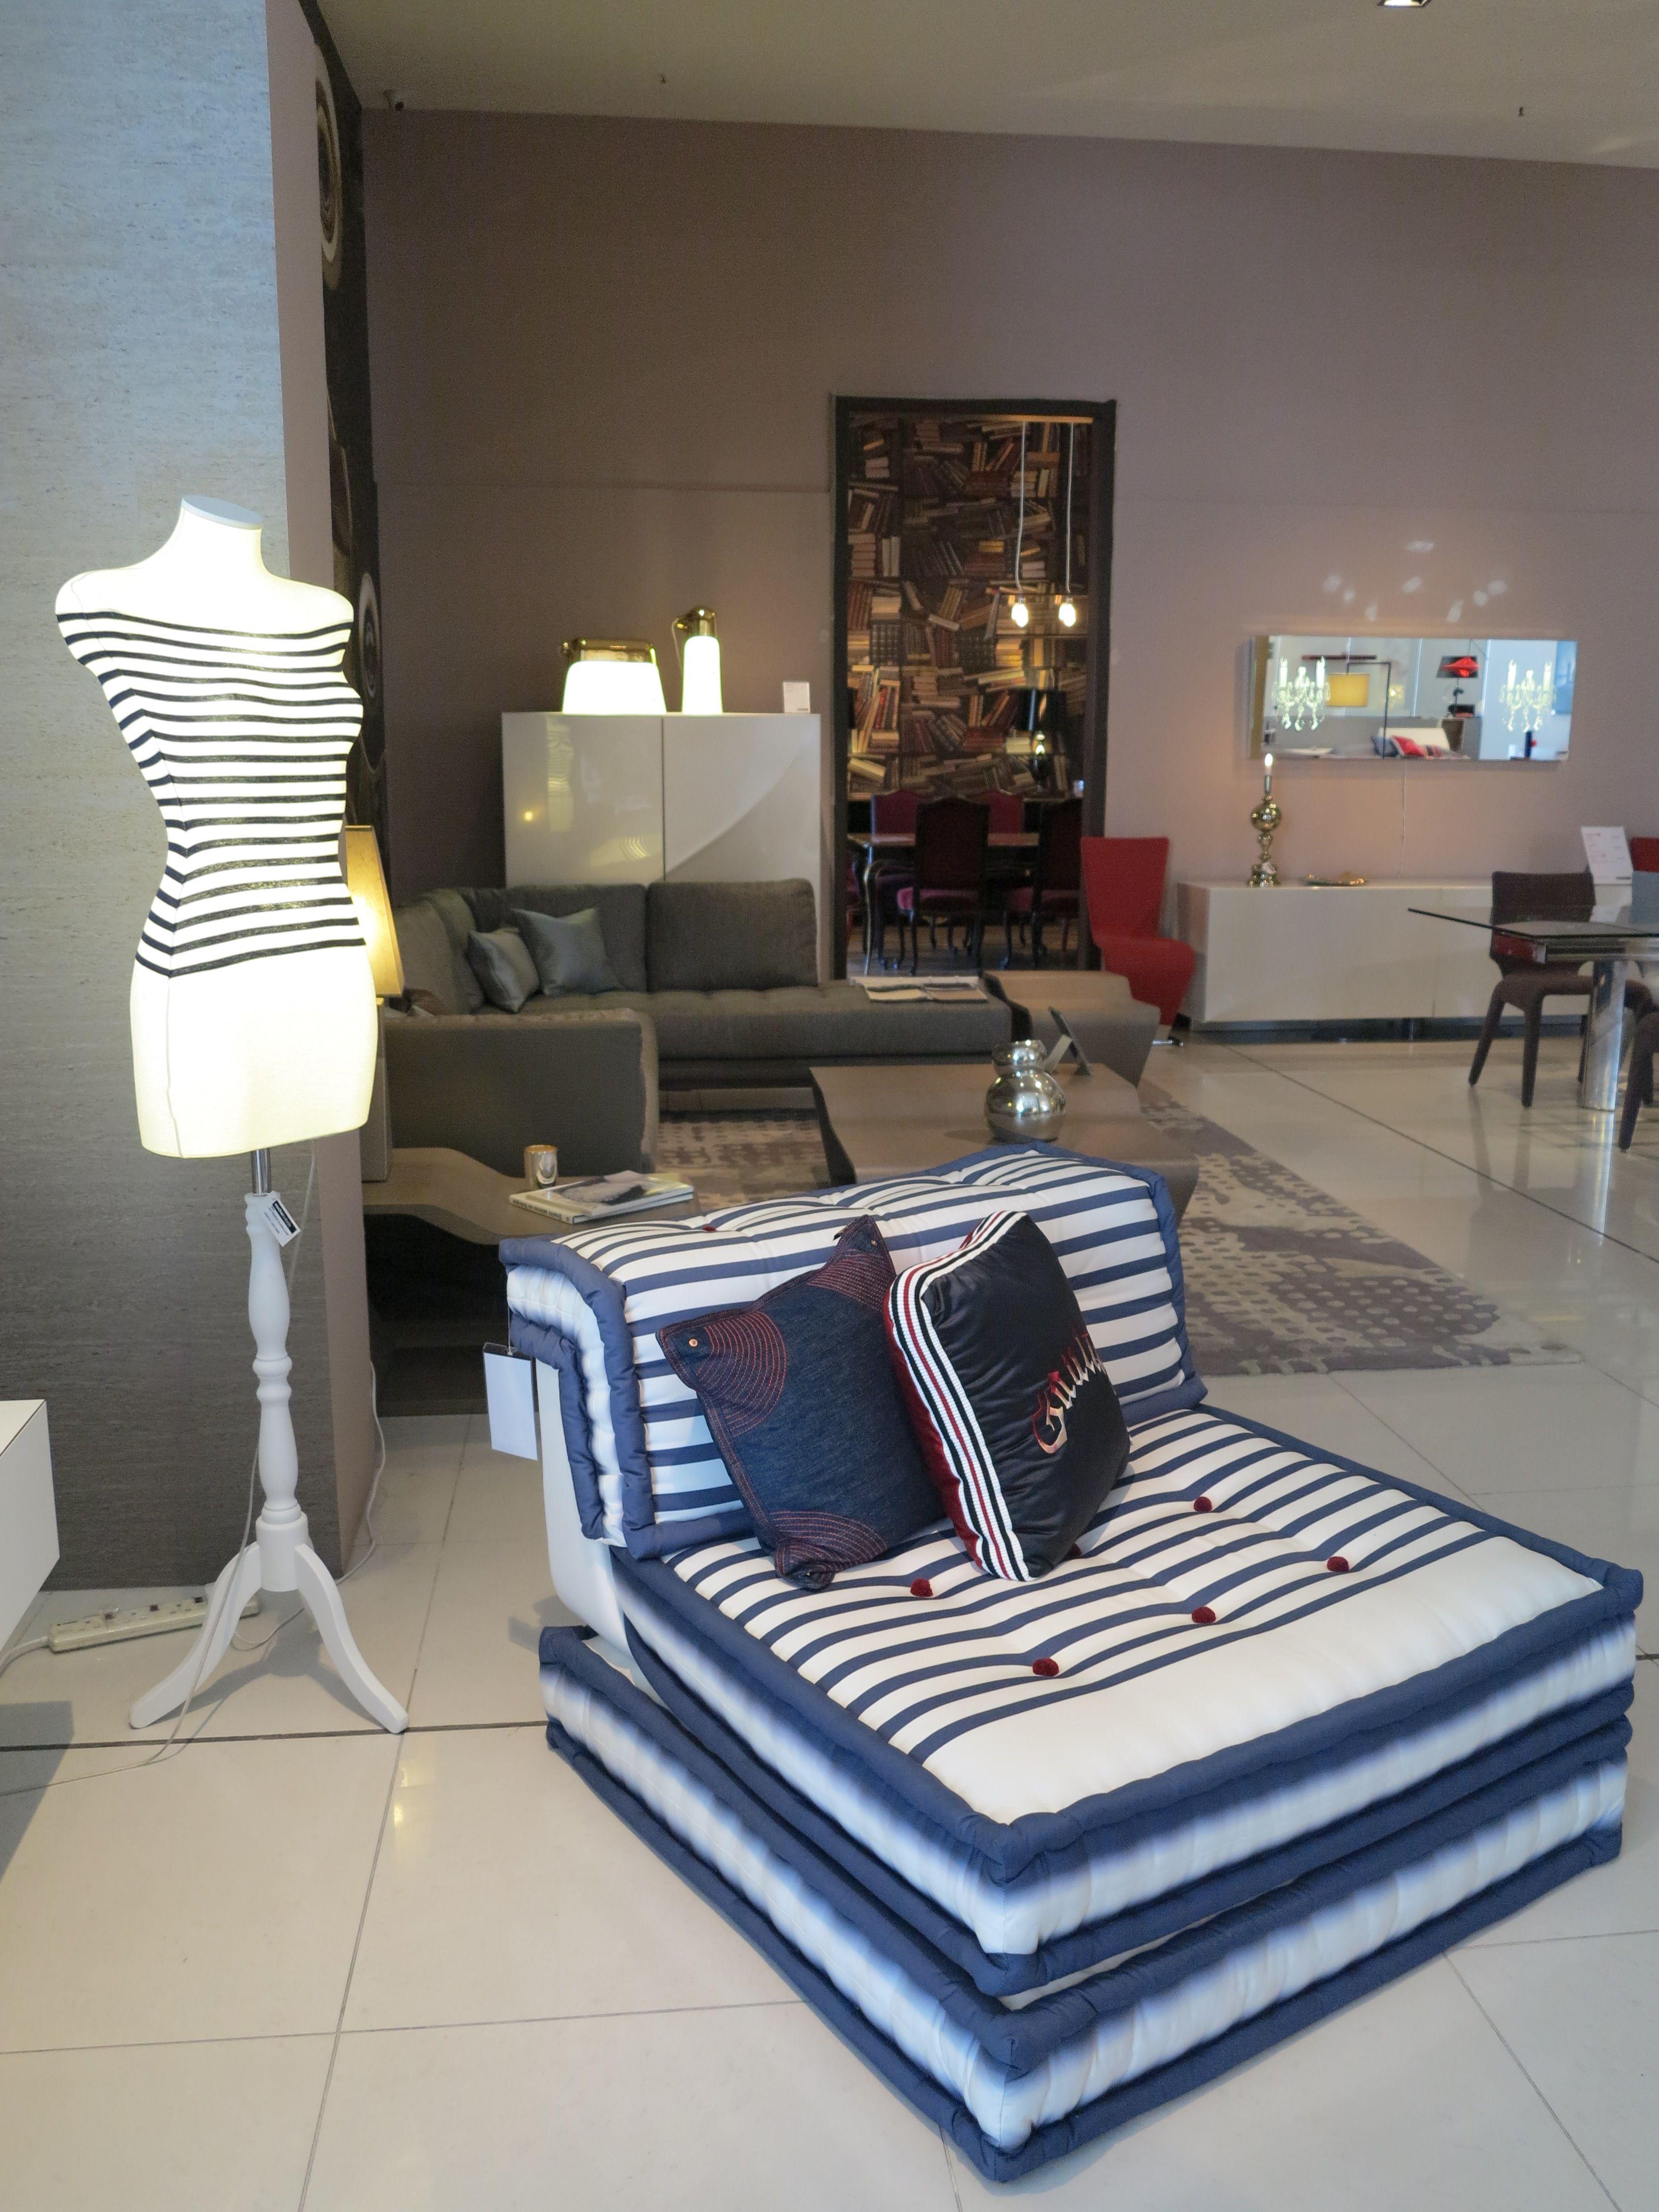 Roche bobois bahrain furniture companies eclectic decor me gustas showroom contemporary furniture